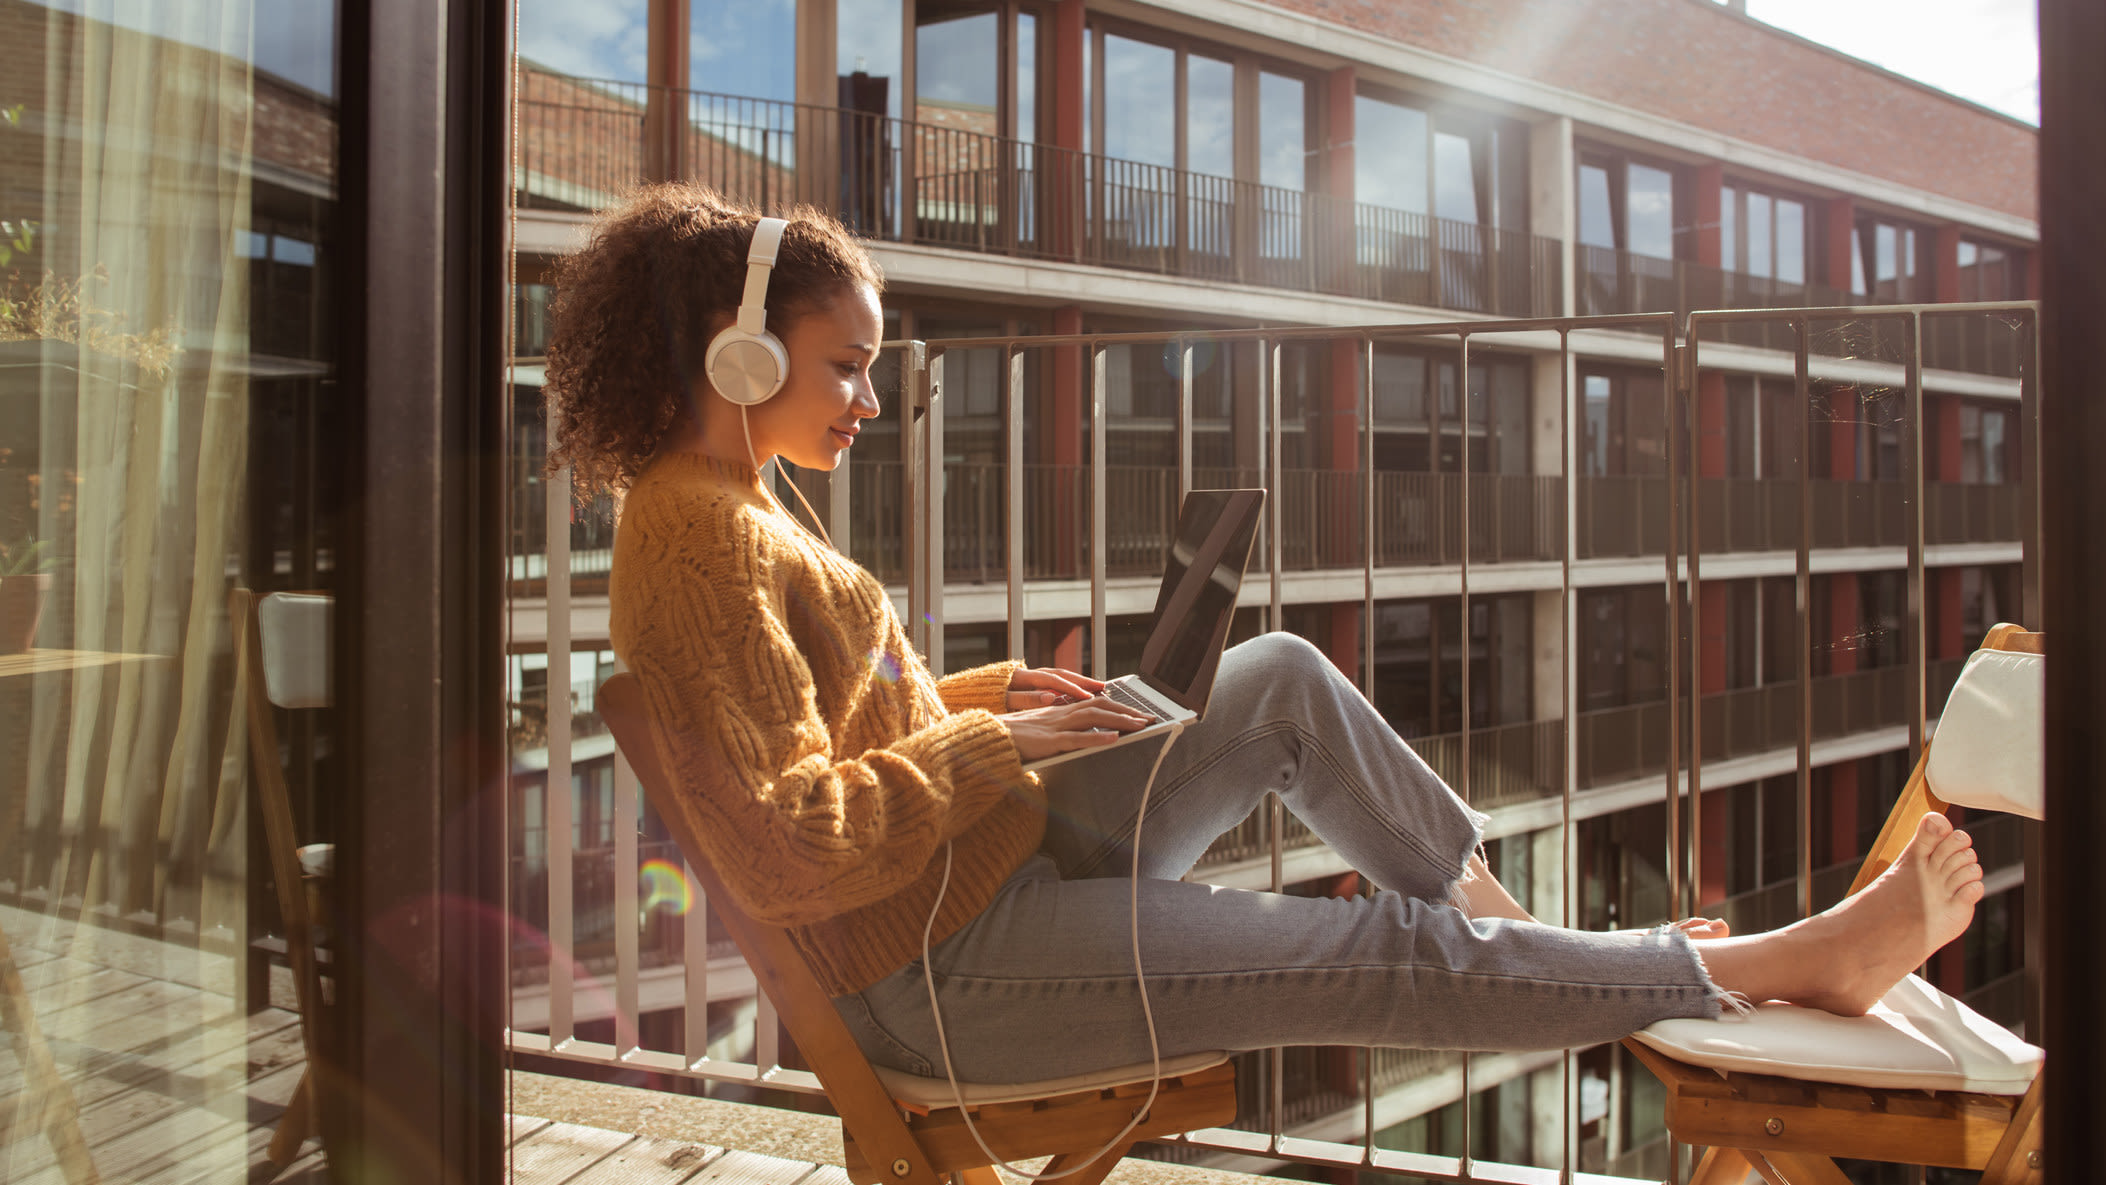 Arbeit, Student, Laptop, Balkon Urheber: Getty Images /  DaniloAndjus